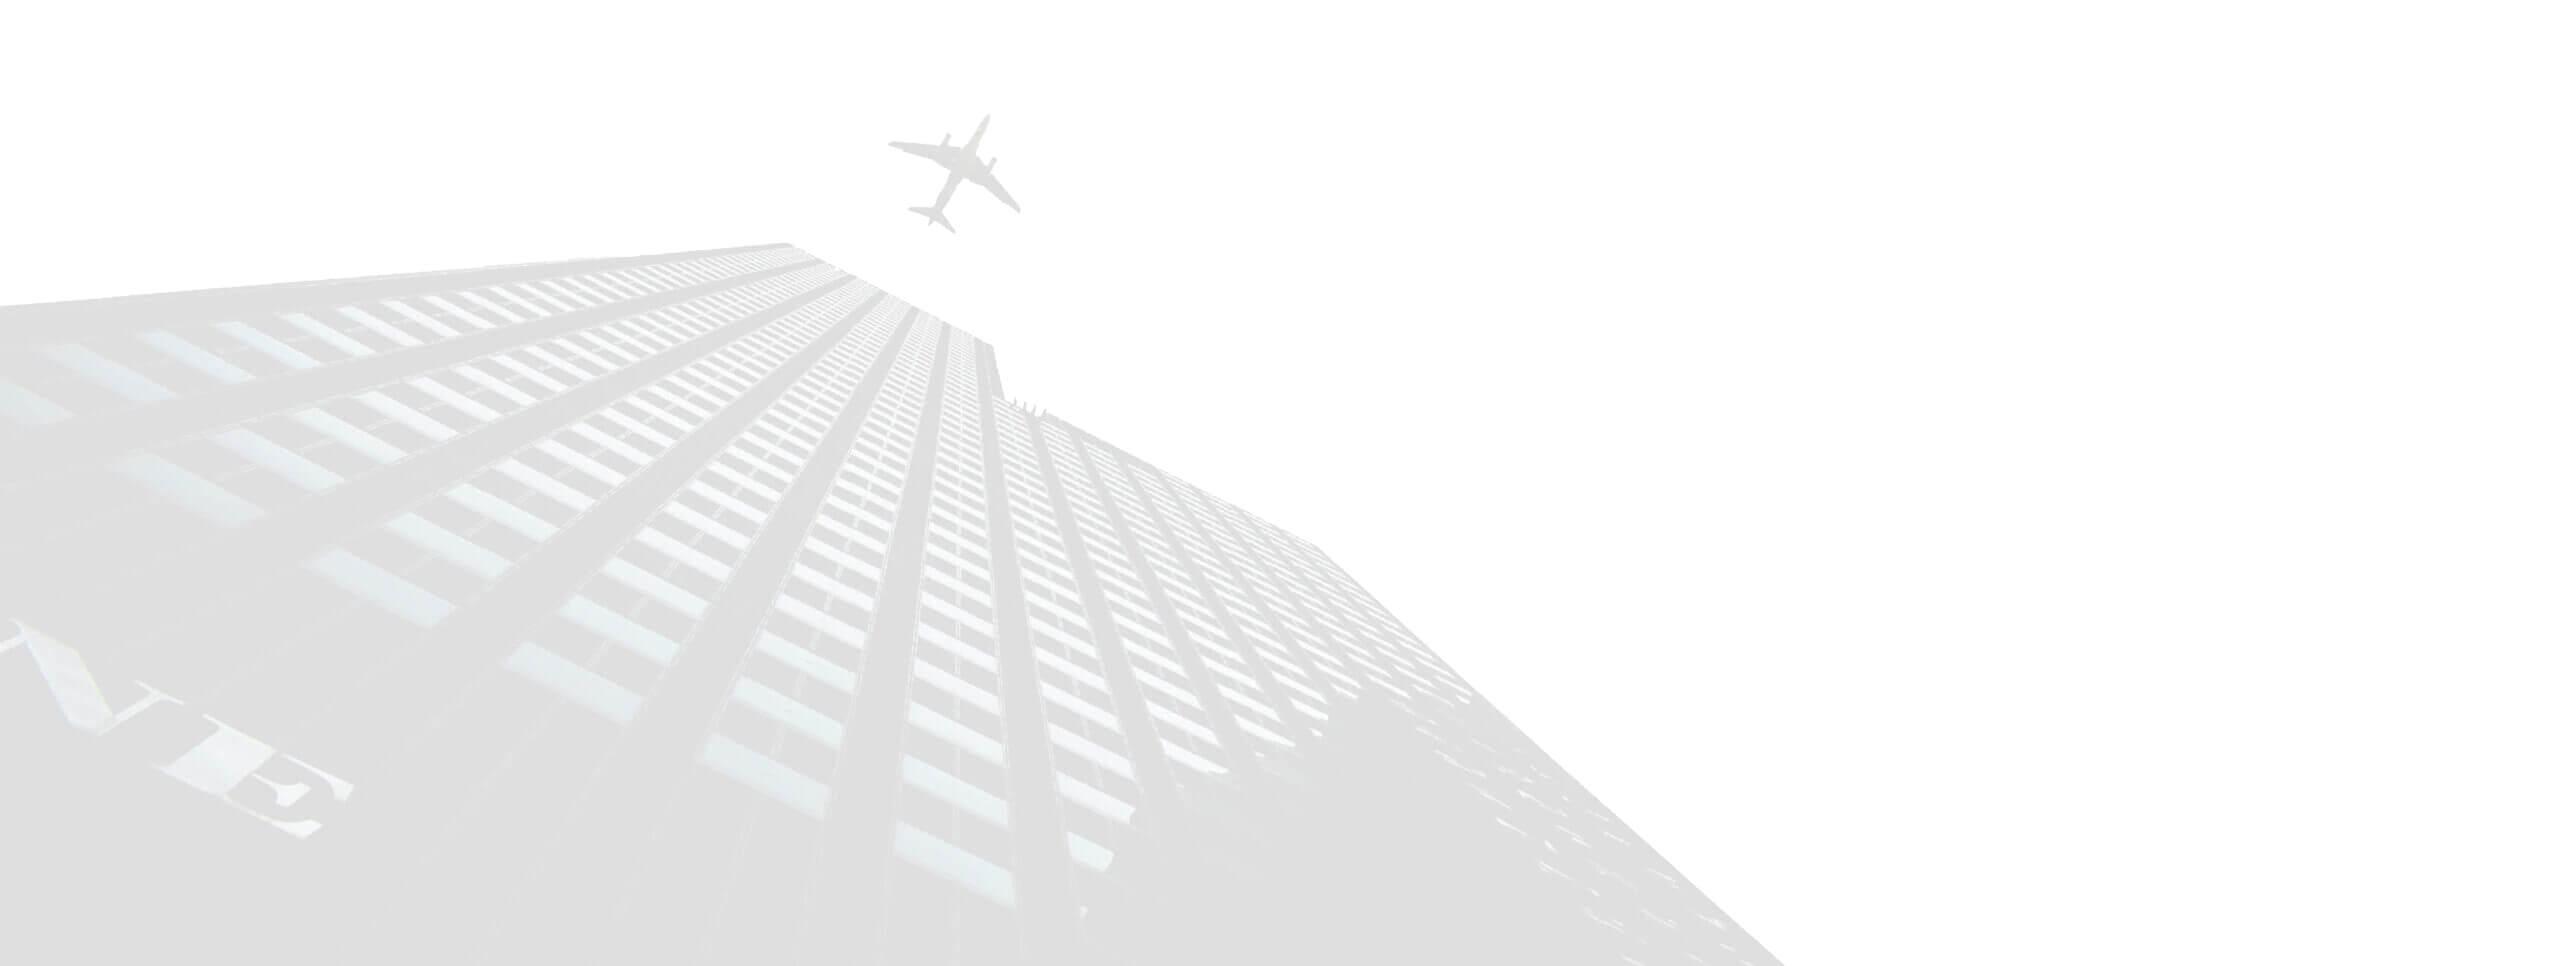 Building + Aeroplane